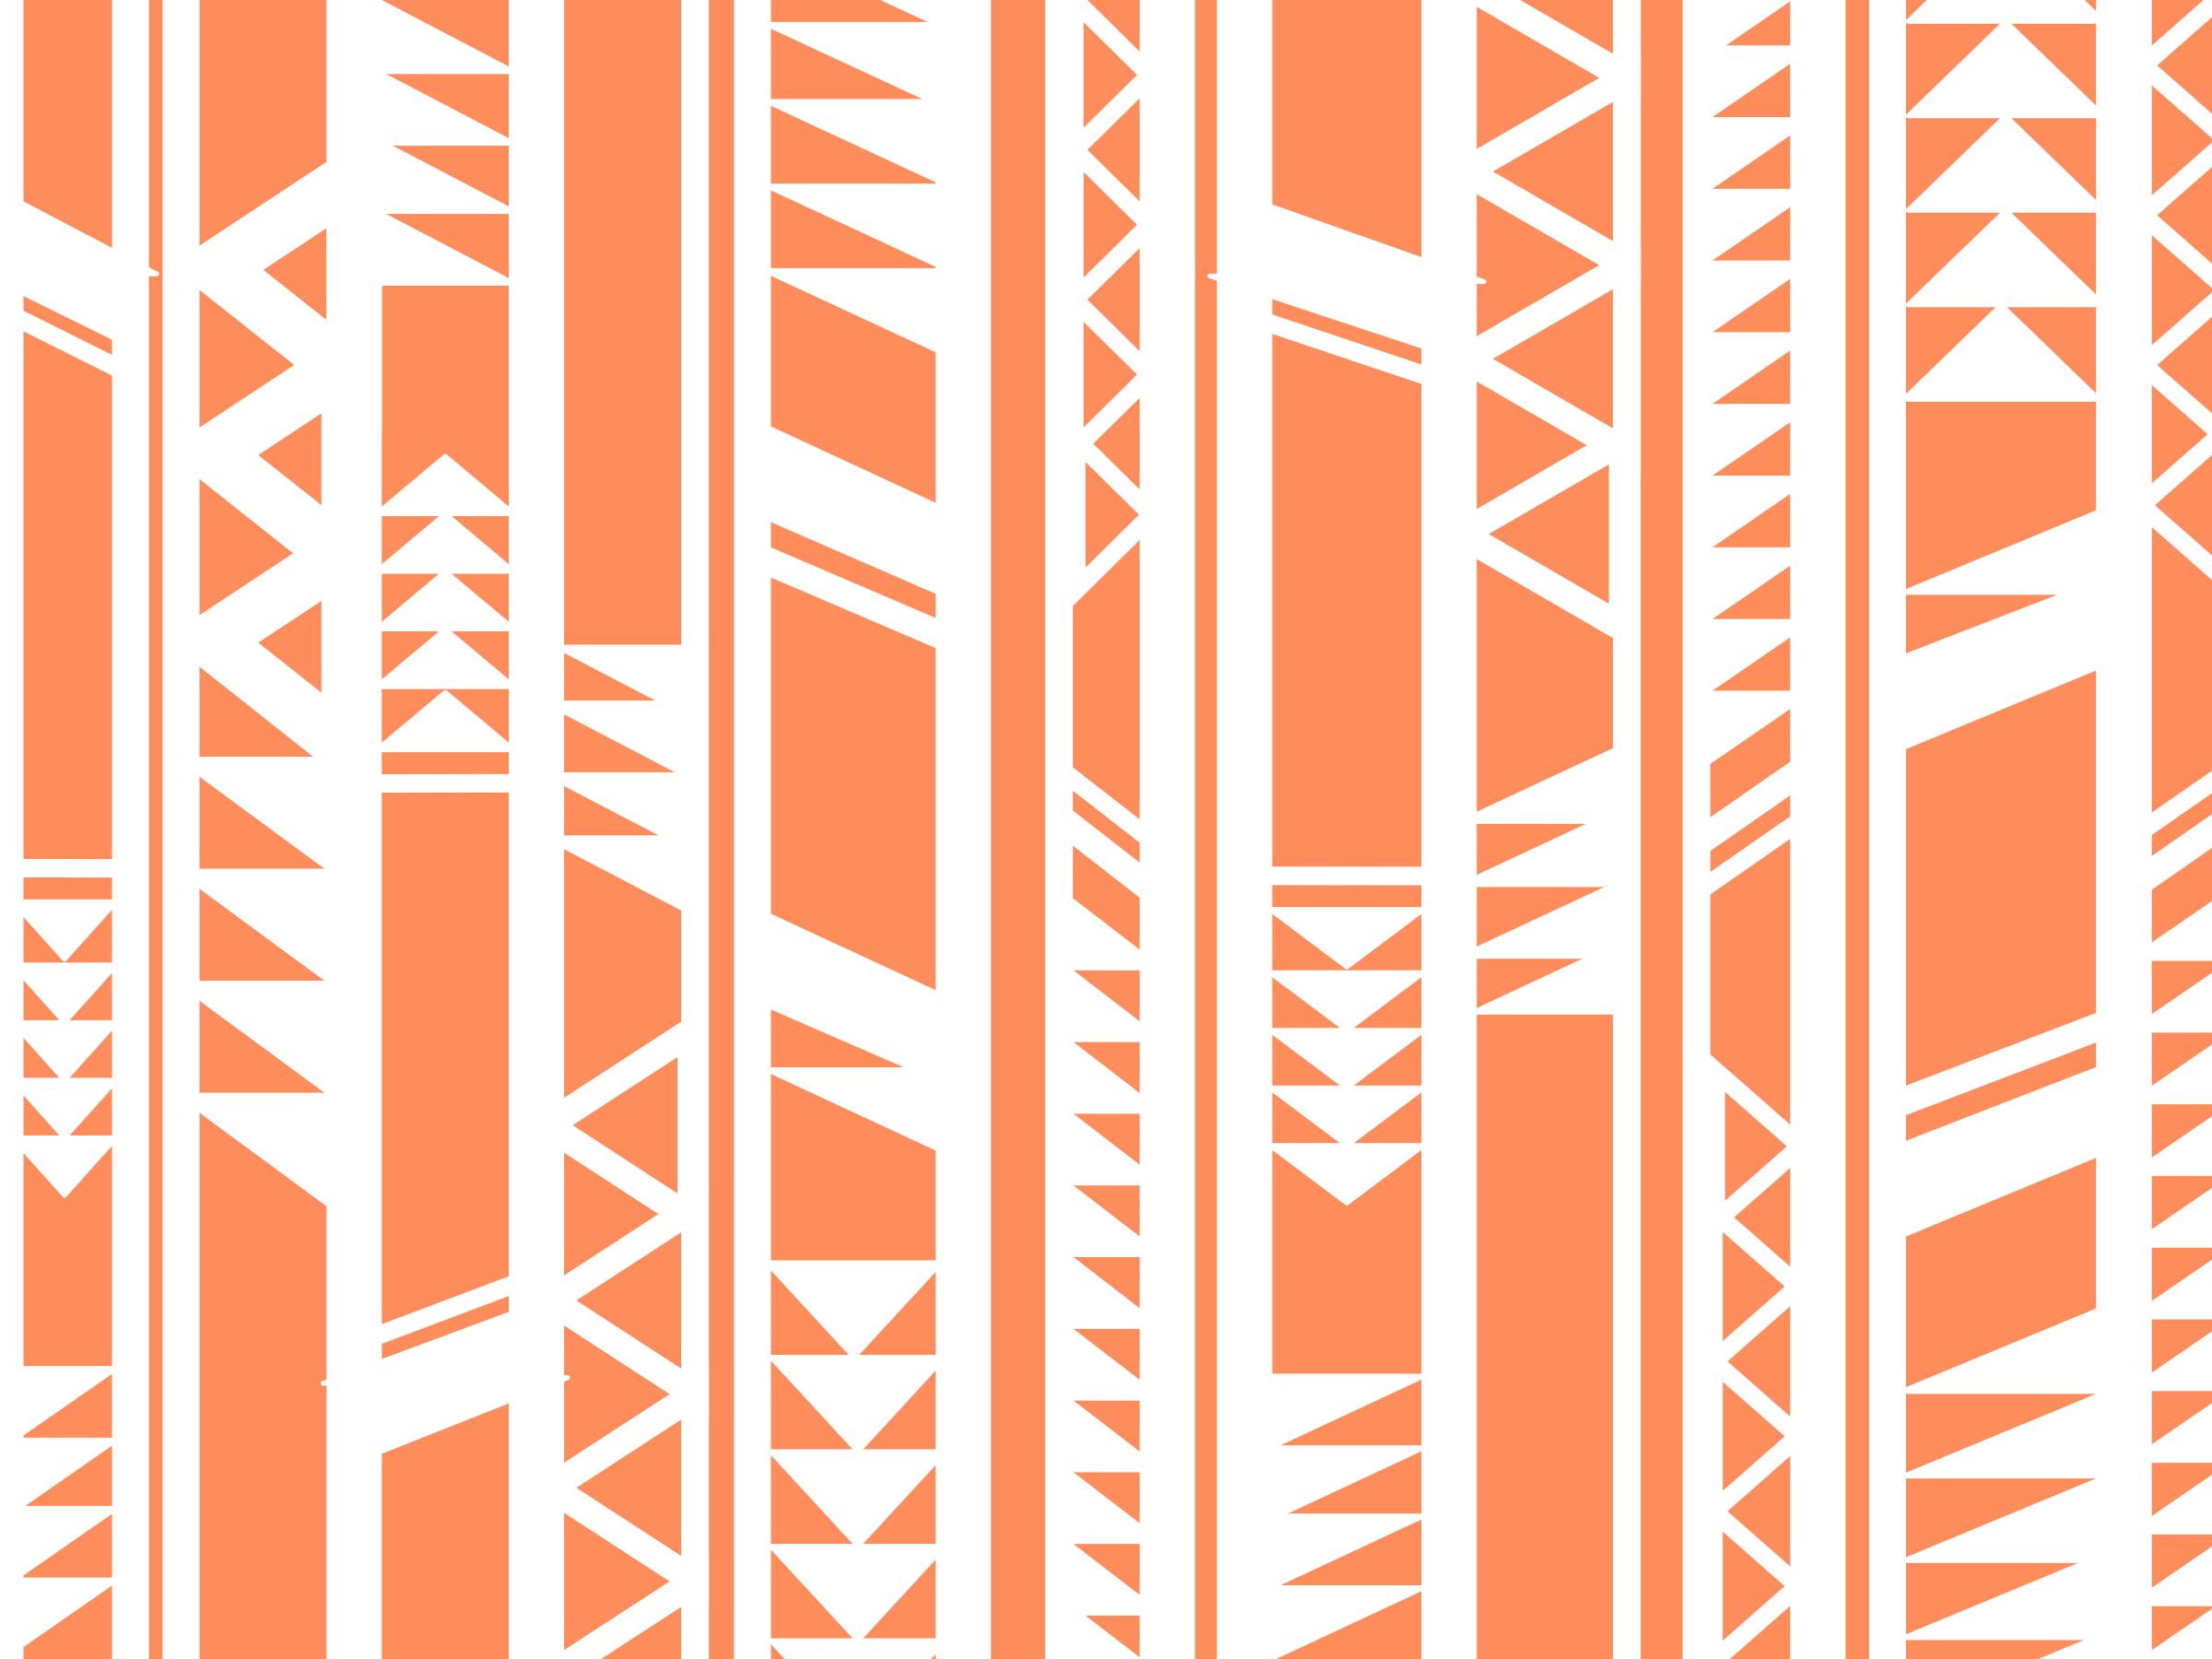 Tribal Pattern by Scout | Patterns | Pinterest | Tribal ... - photo#4